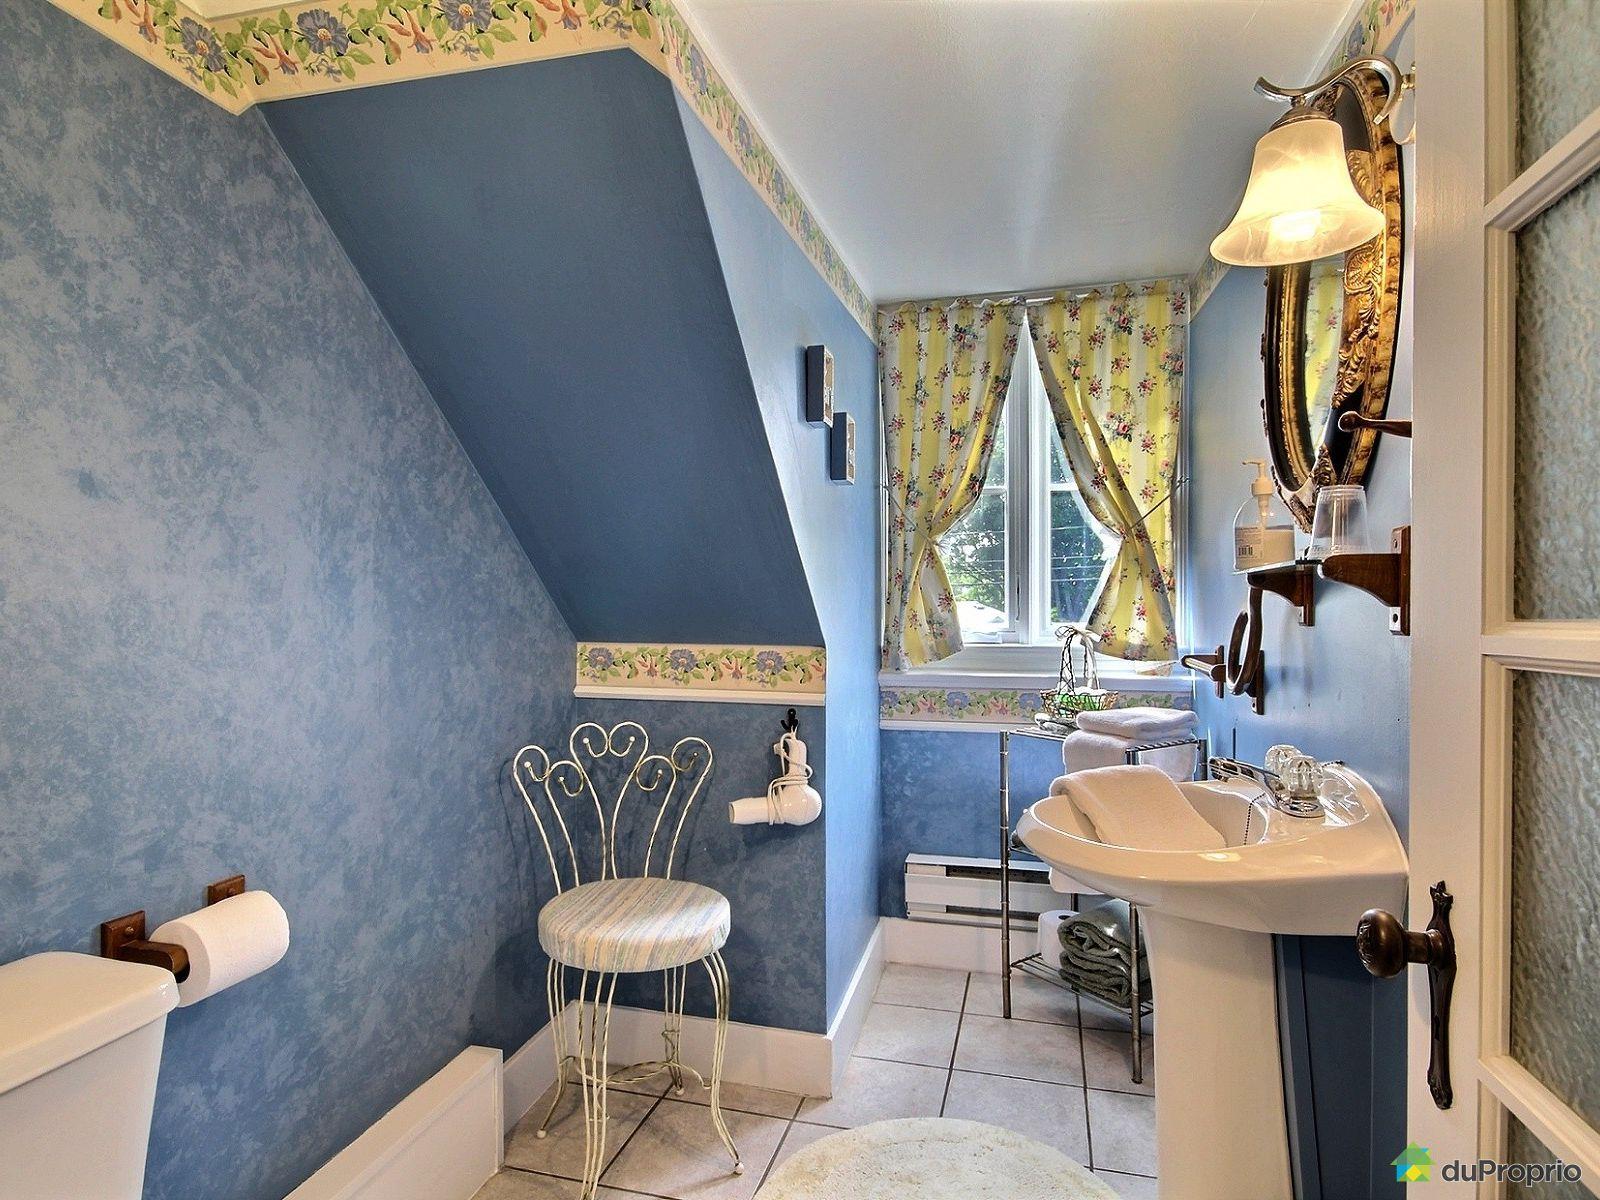 maison vendre ile d 39 orl ans st laurent 7038 chemin royal immobilier qu bec duproprio 705691. Black Bedroom Furniture Sets. Home Design Ideas